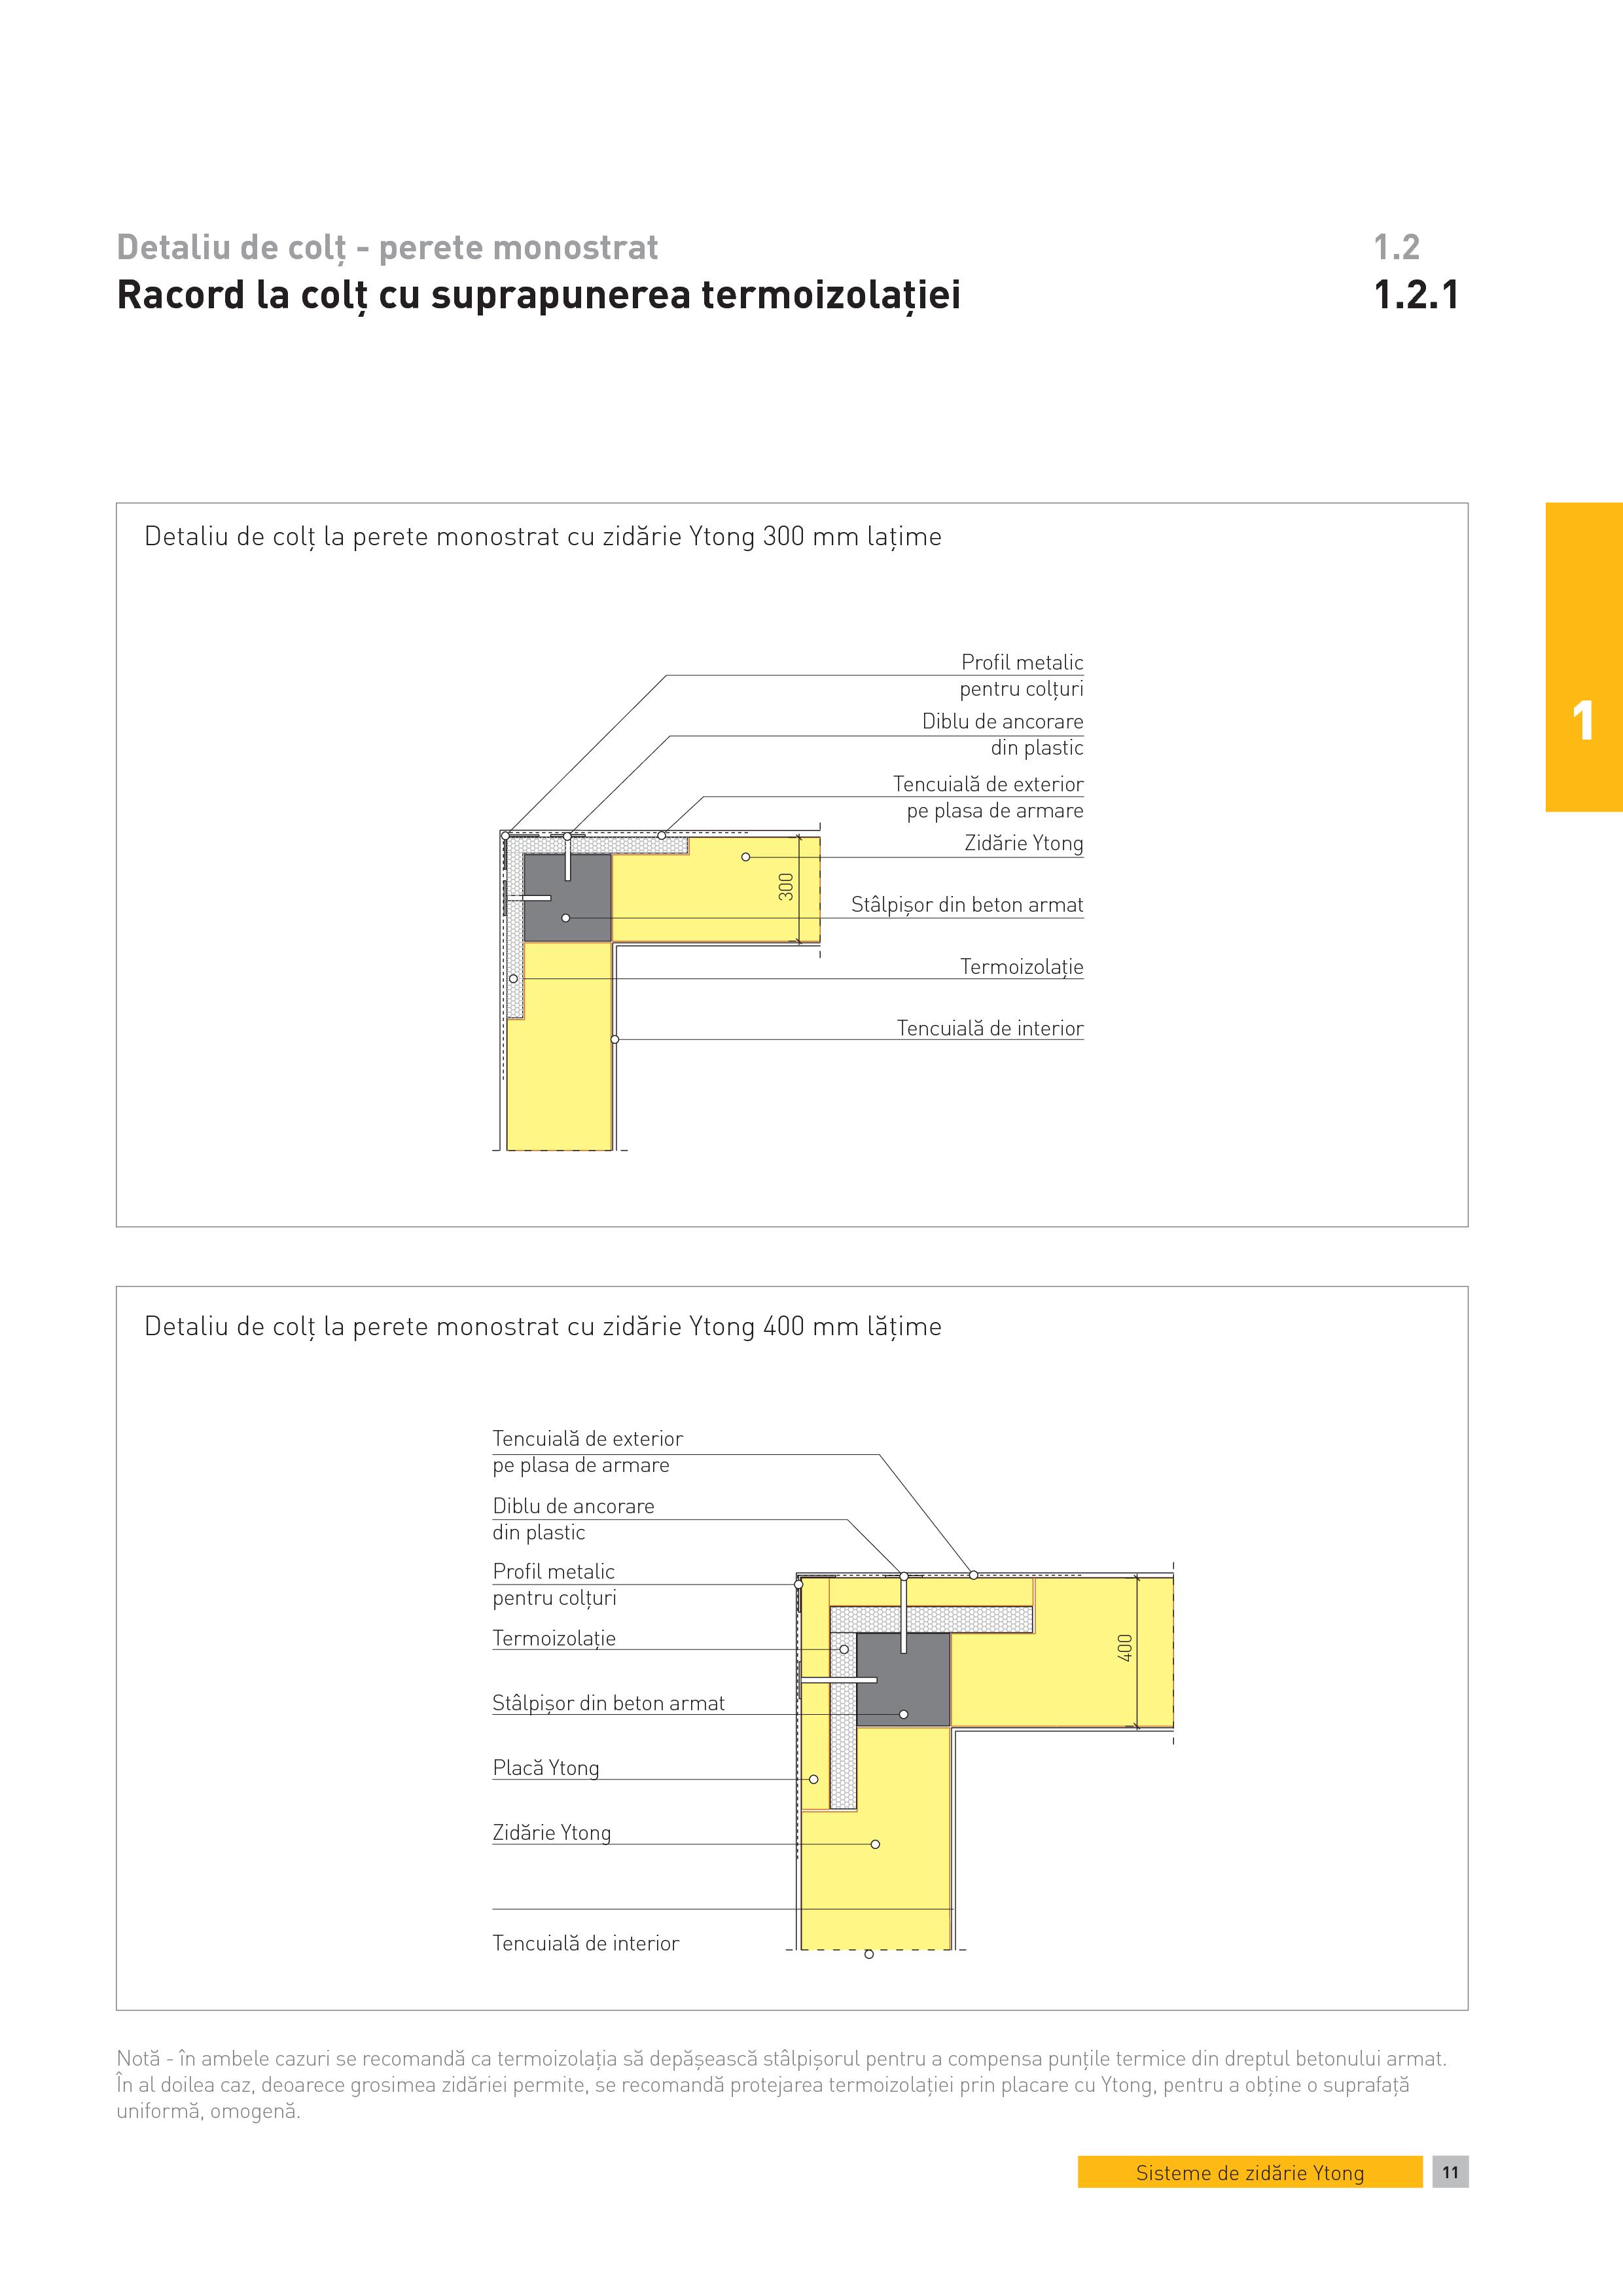 Pagina 1 - CAD-PDF Detaliu de colt - perete monostrat. Racord la colt cu suprapunerea termoizolatiei...